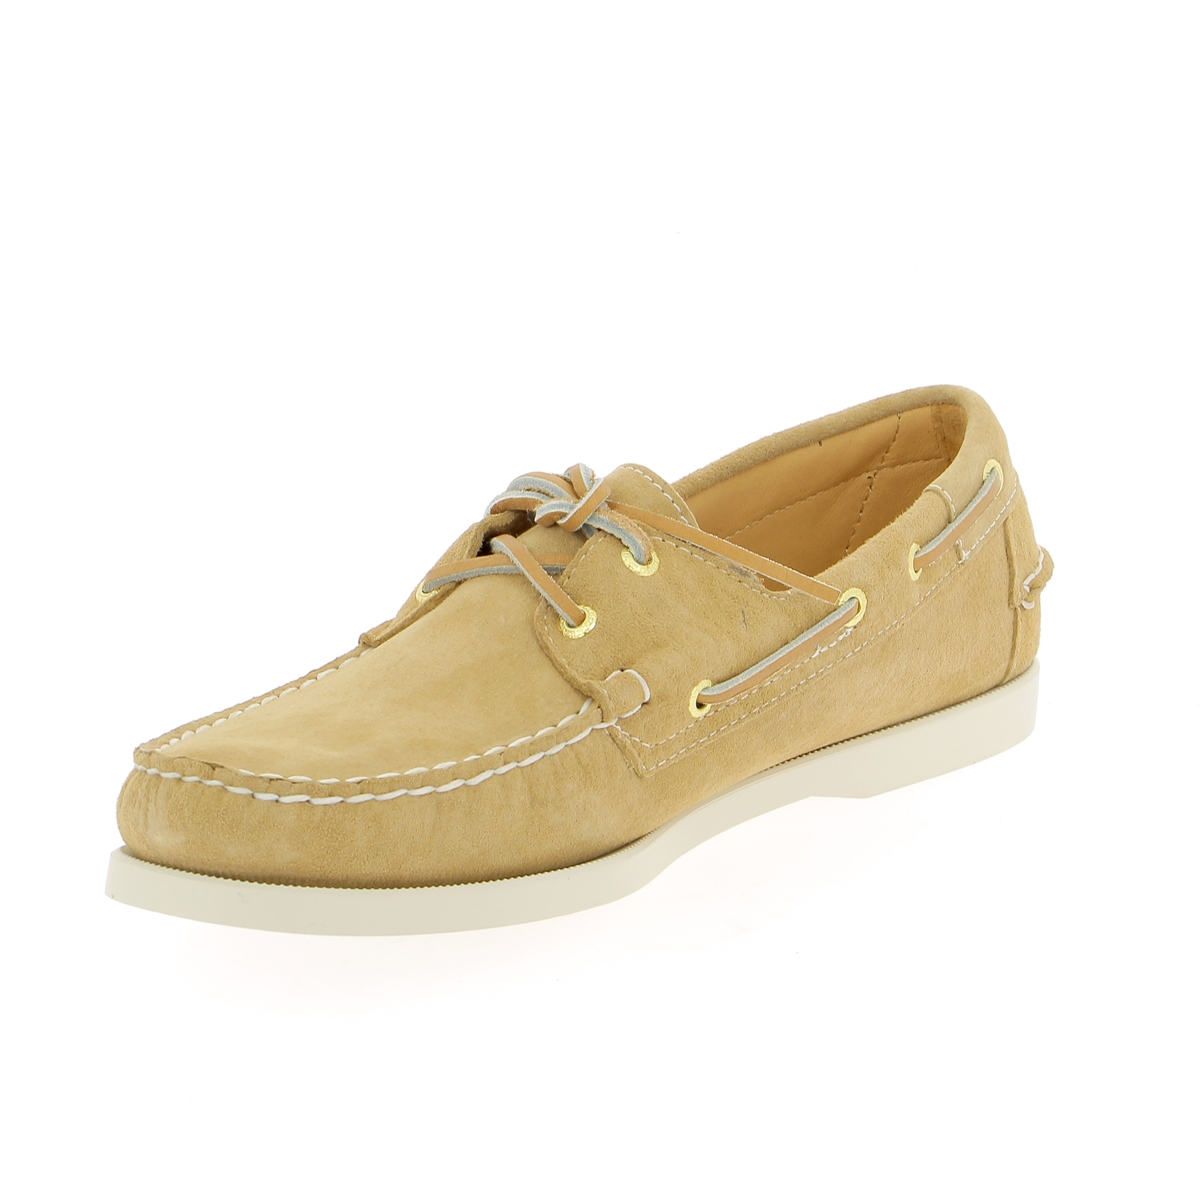 Sebago Bootschoenen beige